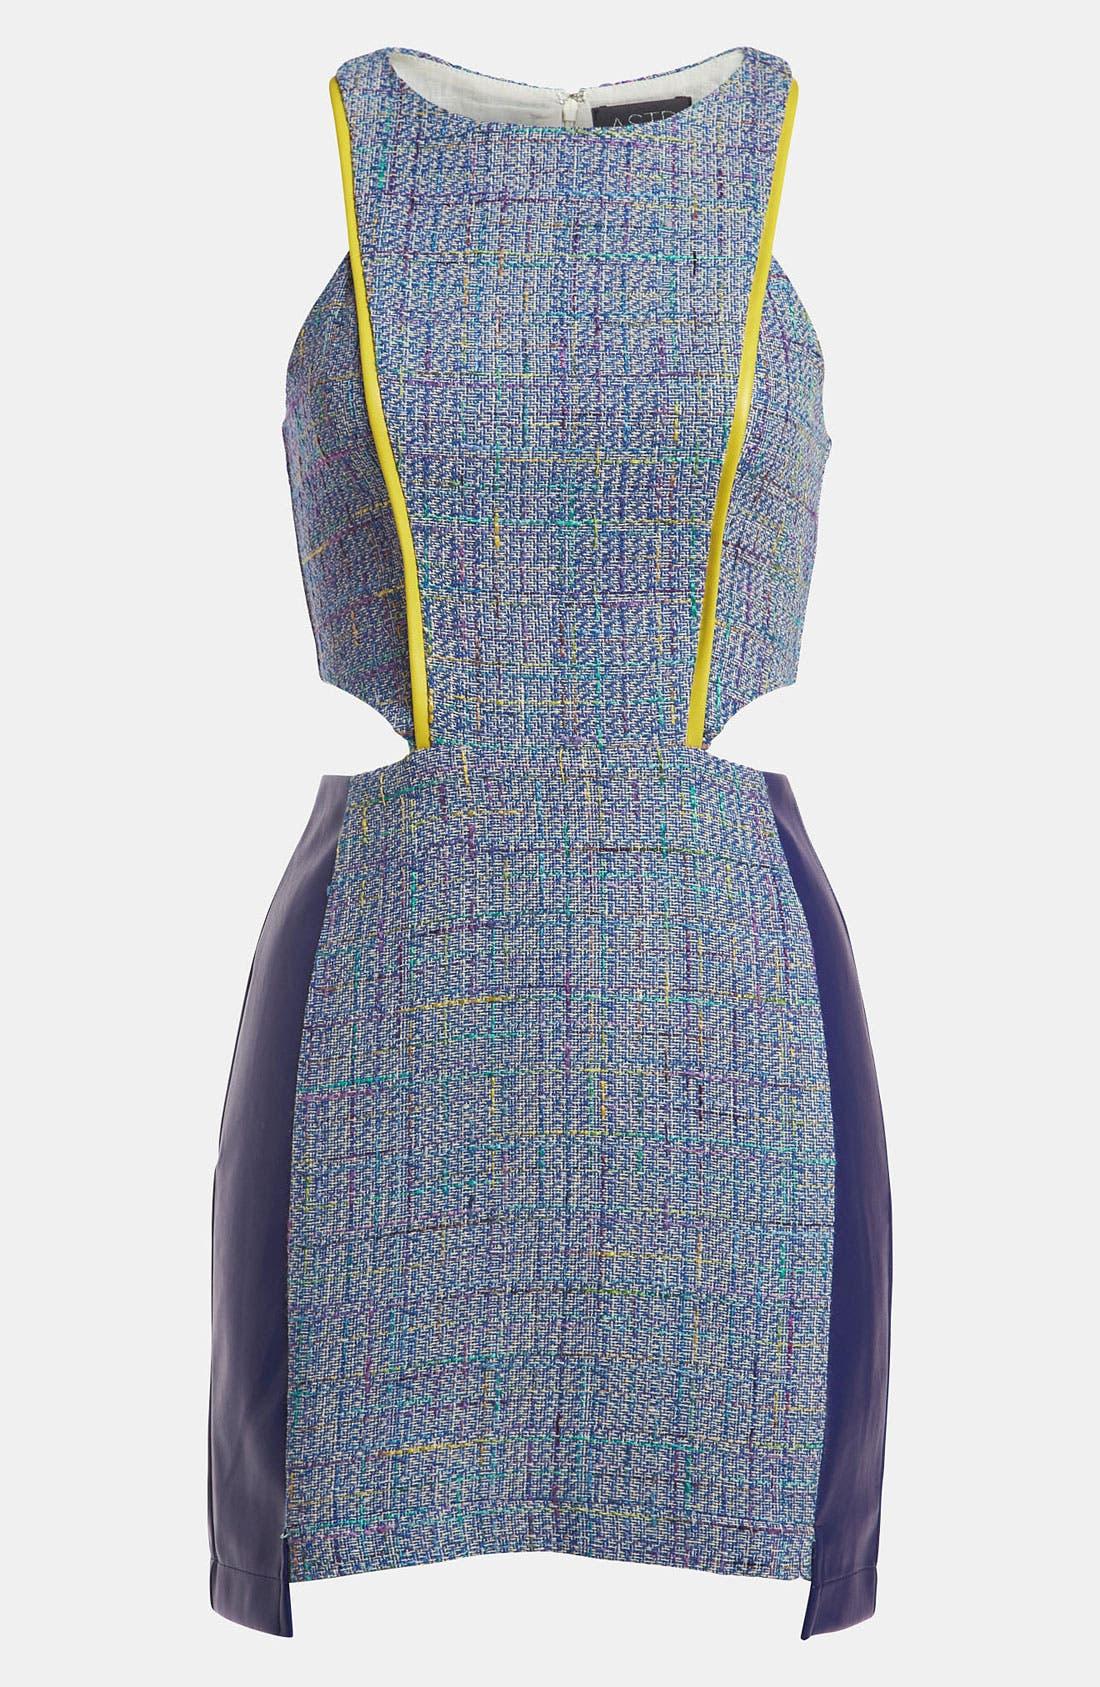 Main Image - ASTR Mixed Media Tweed Dress